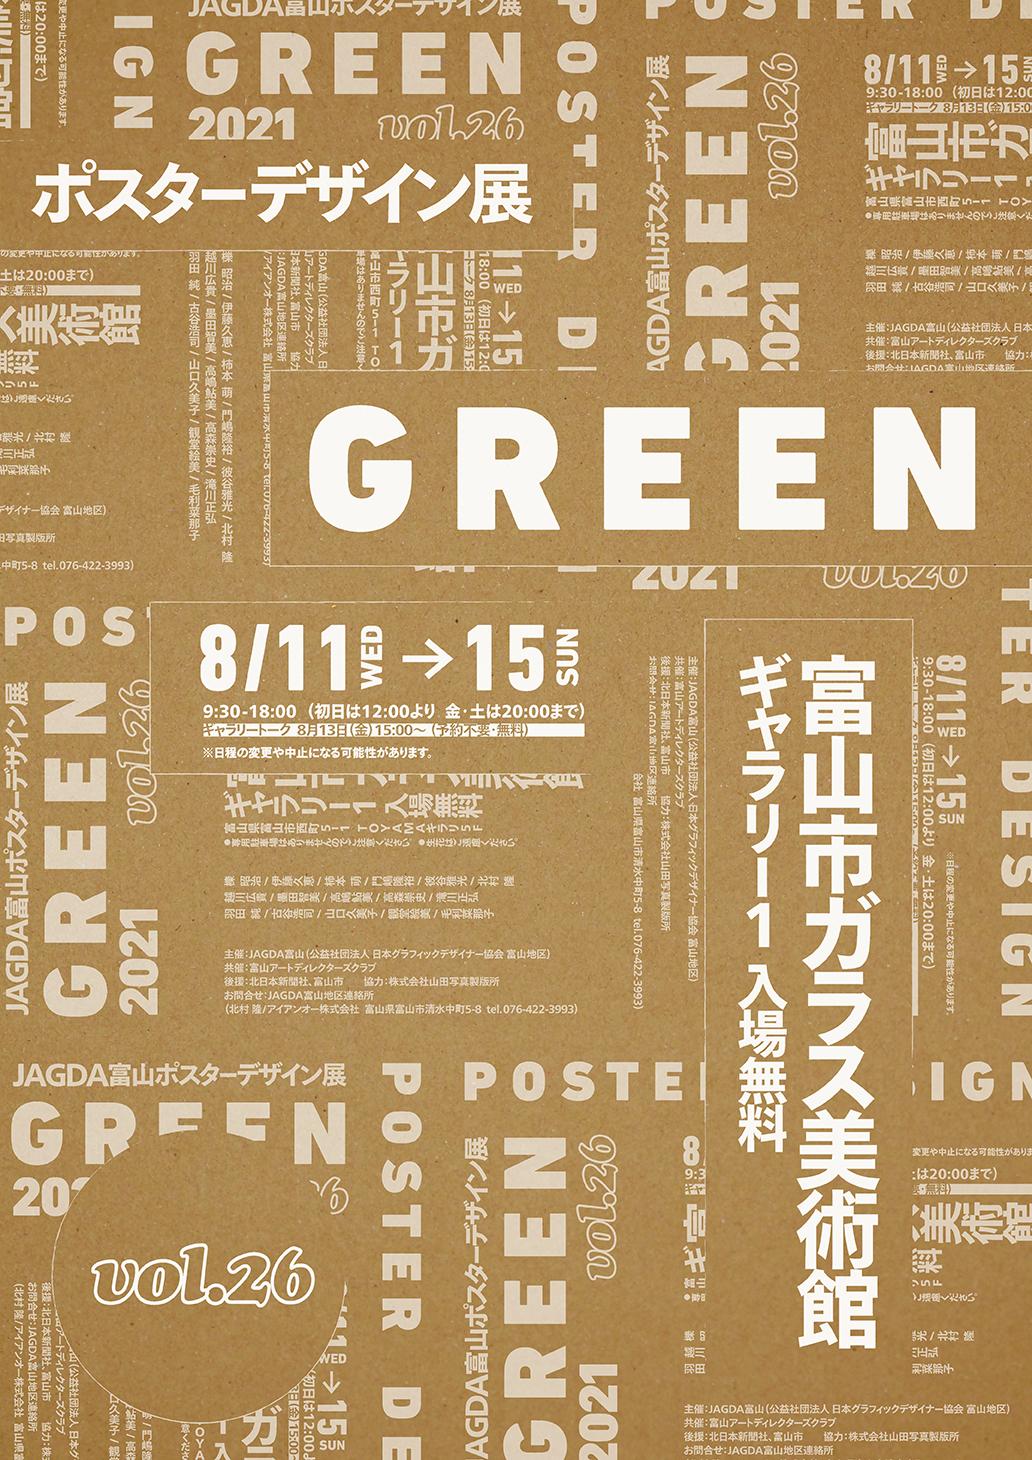 JAGDA富山ポスターデザイン展2021 GREEN vol.26【JAGDA富山地区】